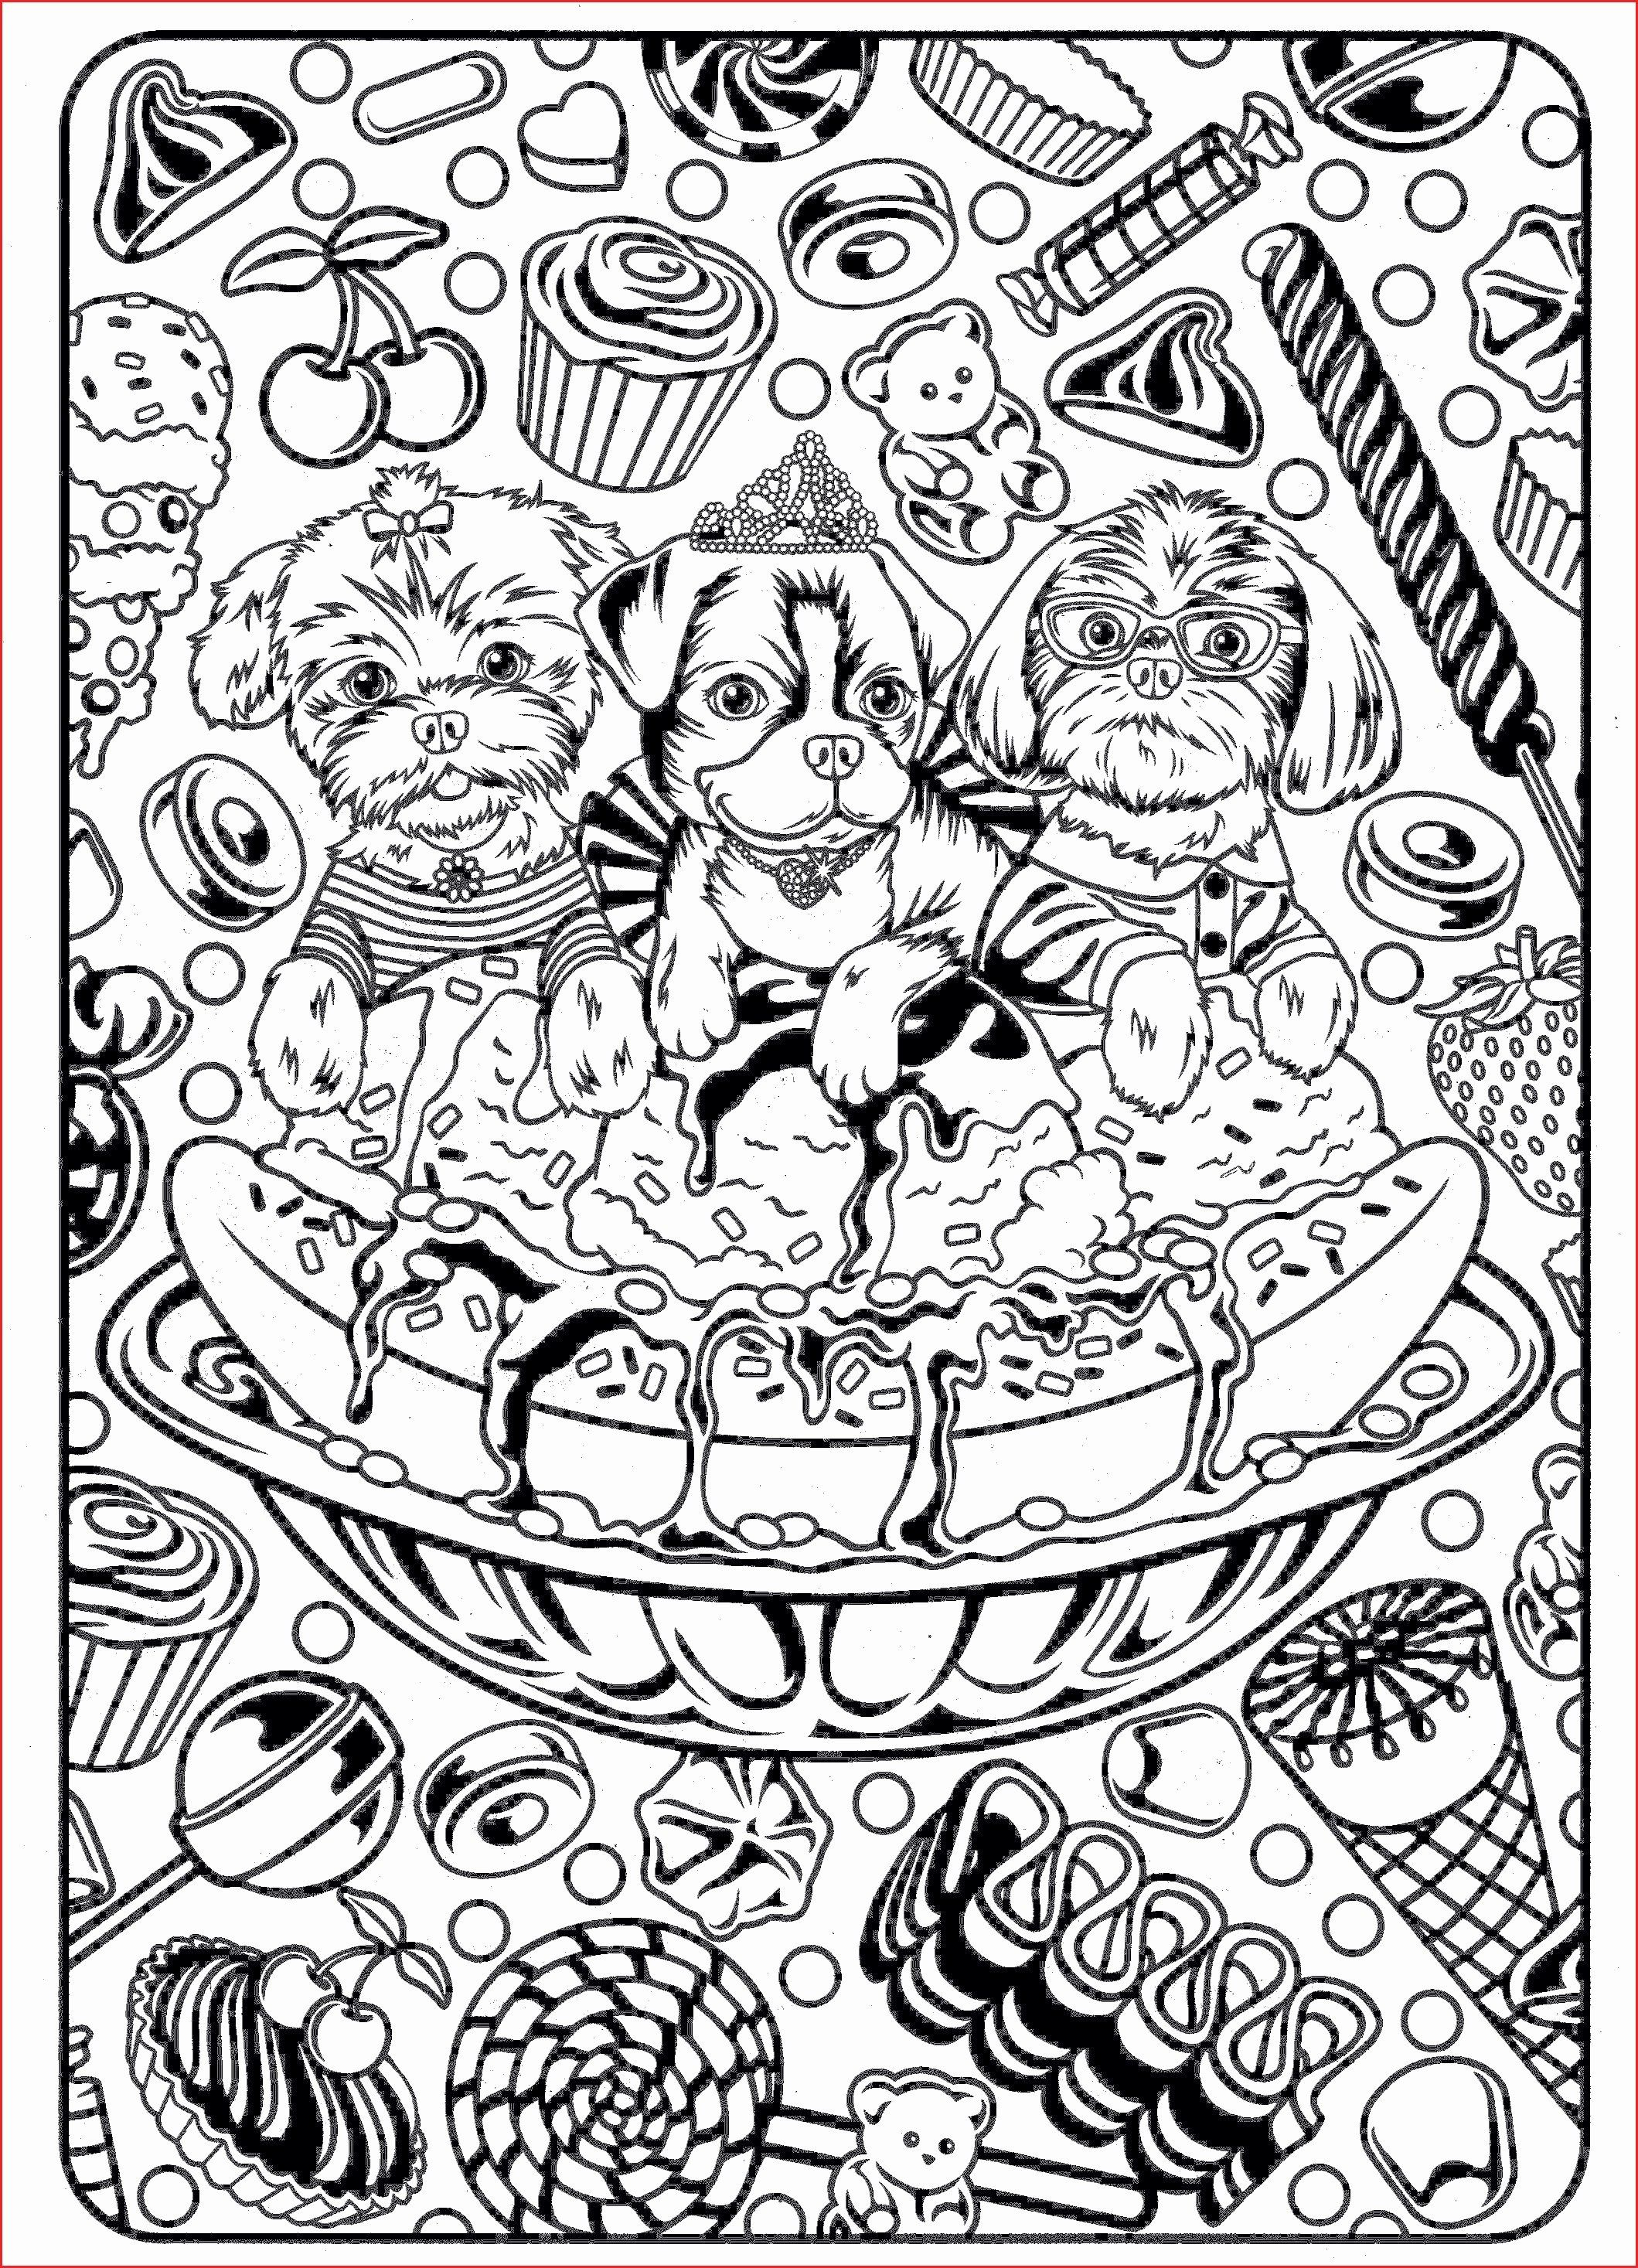 Sea Shell Coloring Book Unique Bee Coloring Page 4377 Coloring Pages For Kids Pokemon Coloring Pages Space Coloring Pages Cool Coloring Pages